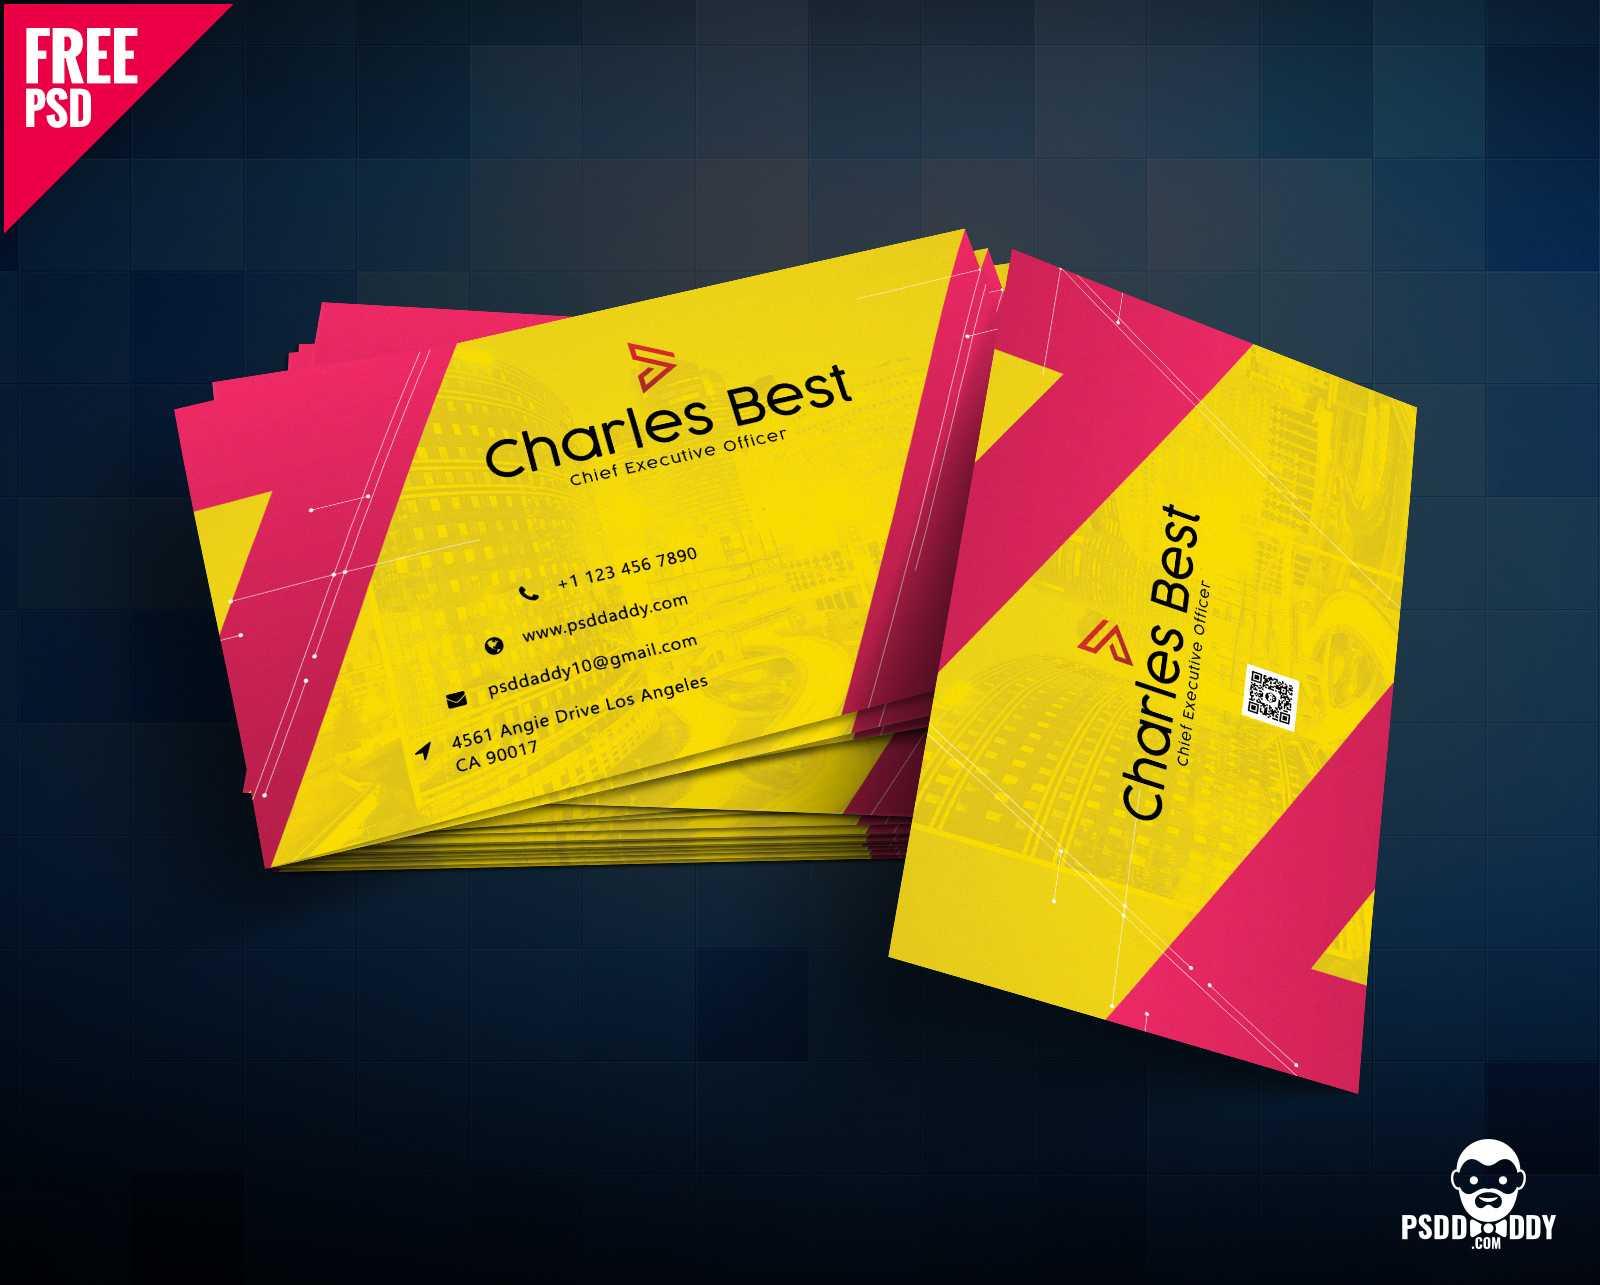 Download] Creative Business Card Free Psd | Psddaddy Regarding Free Psd Visiting Card Templates Download